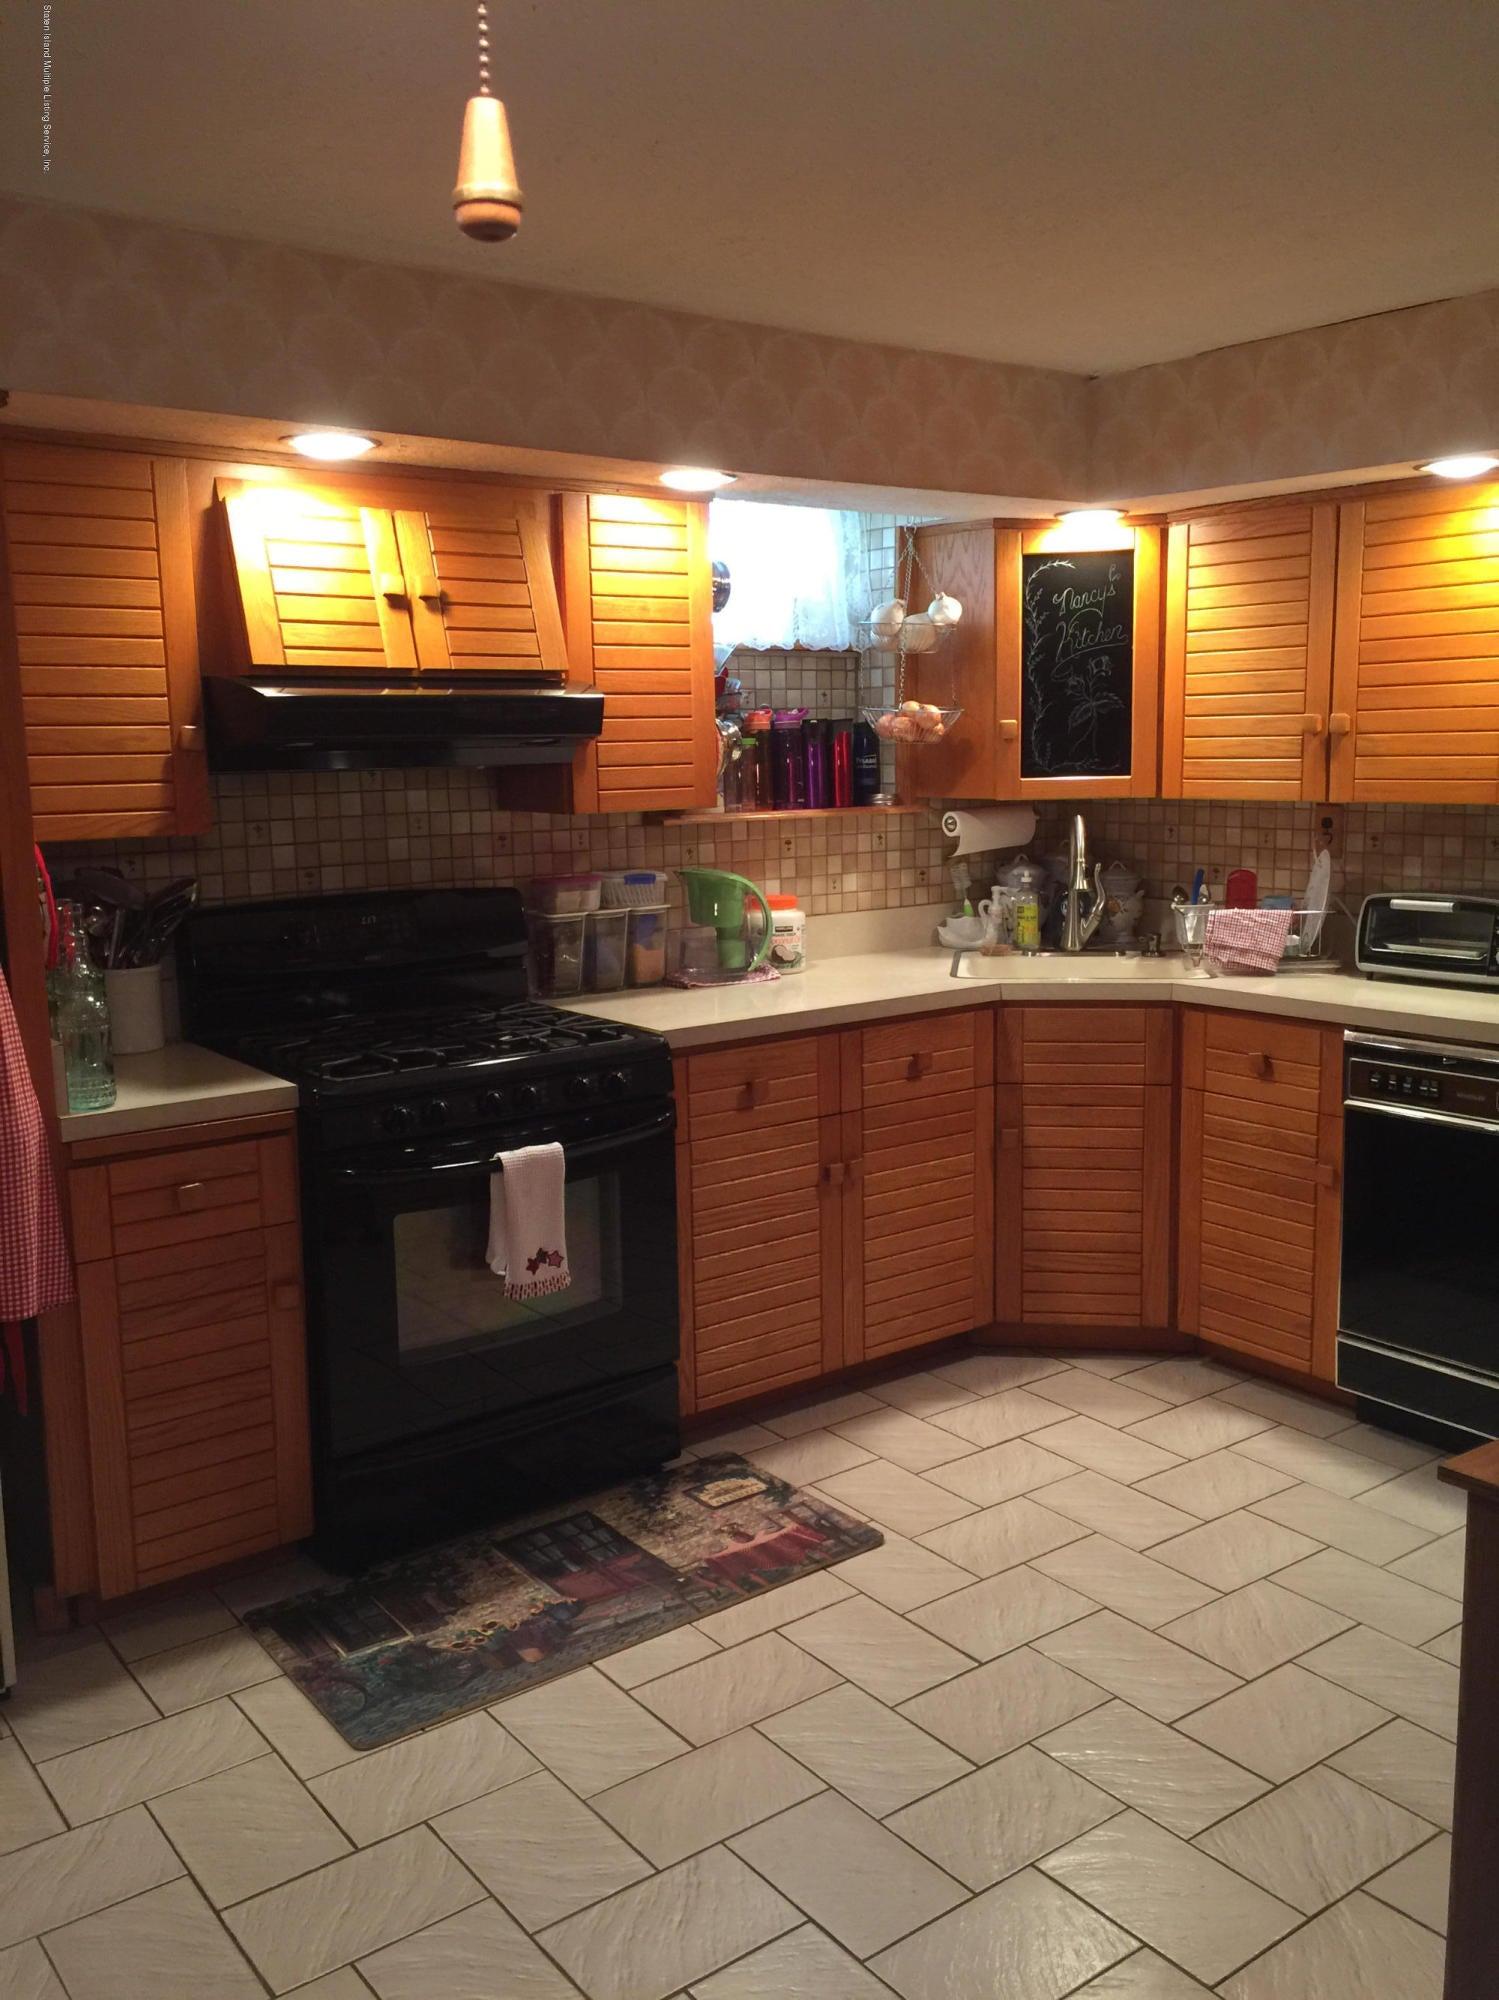 Single Family - Detached 108 Clarke Avenue  Staten Island, NY 10306, MLS-1106455-35